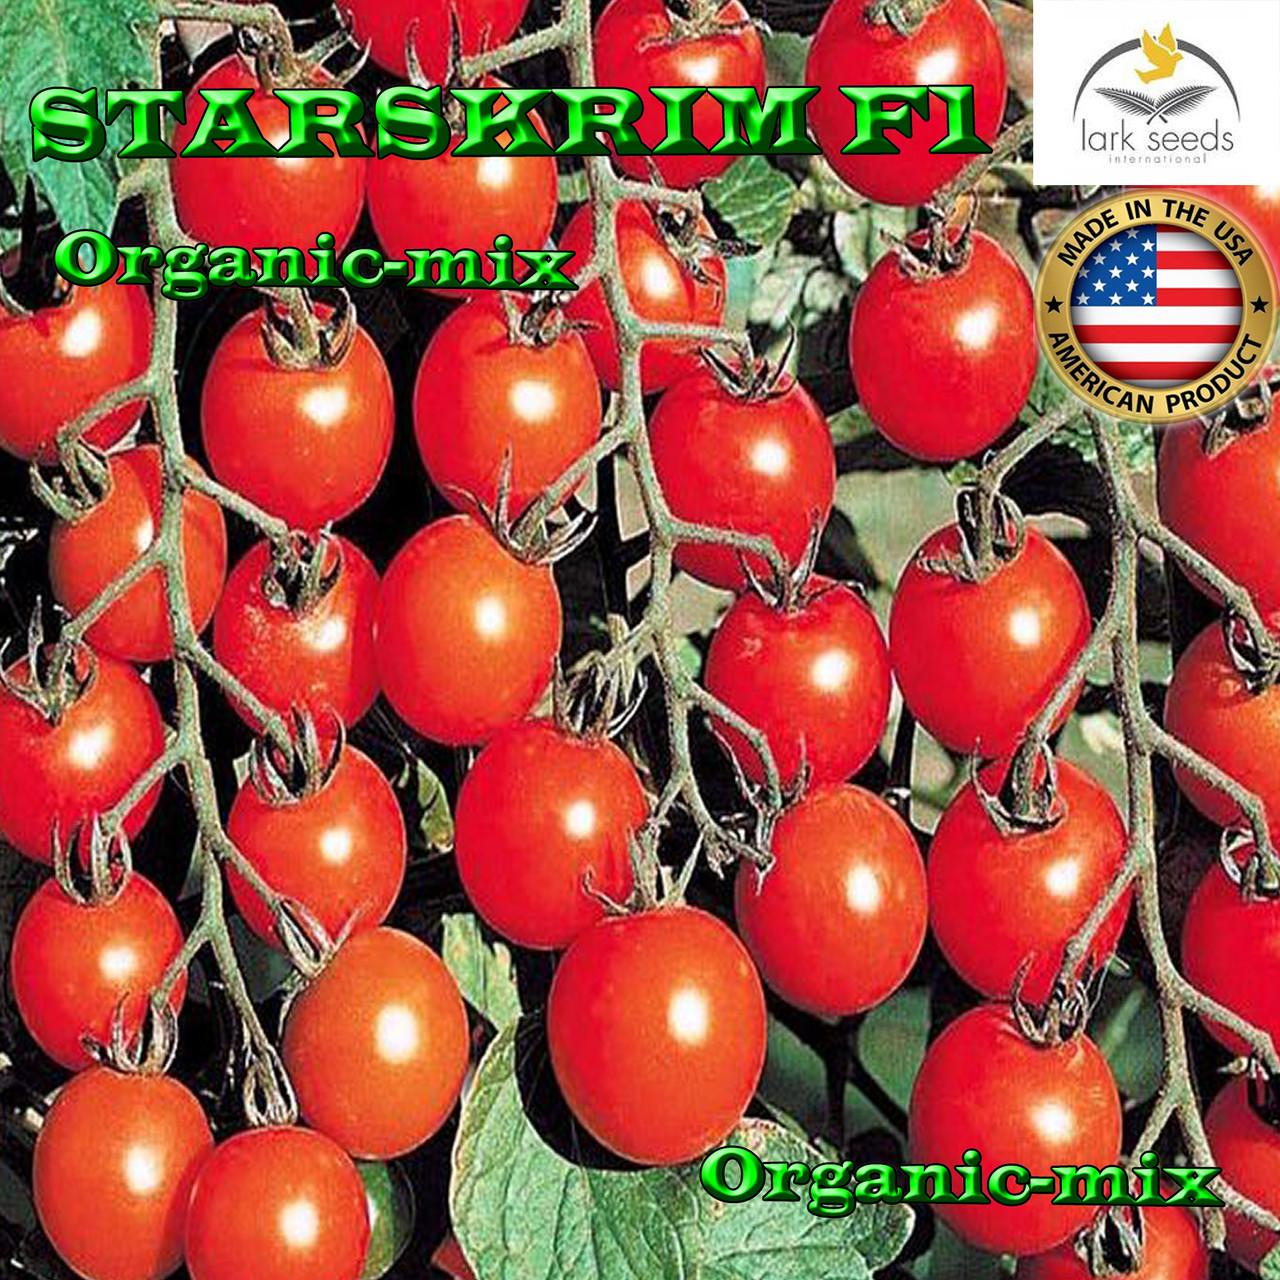 Семена, томат Черри (низкорослый) СТАРСКРИМ F1, ТМ Lark Seeds, 1000 семян